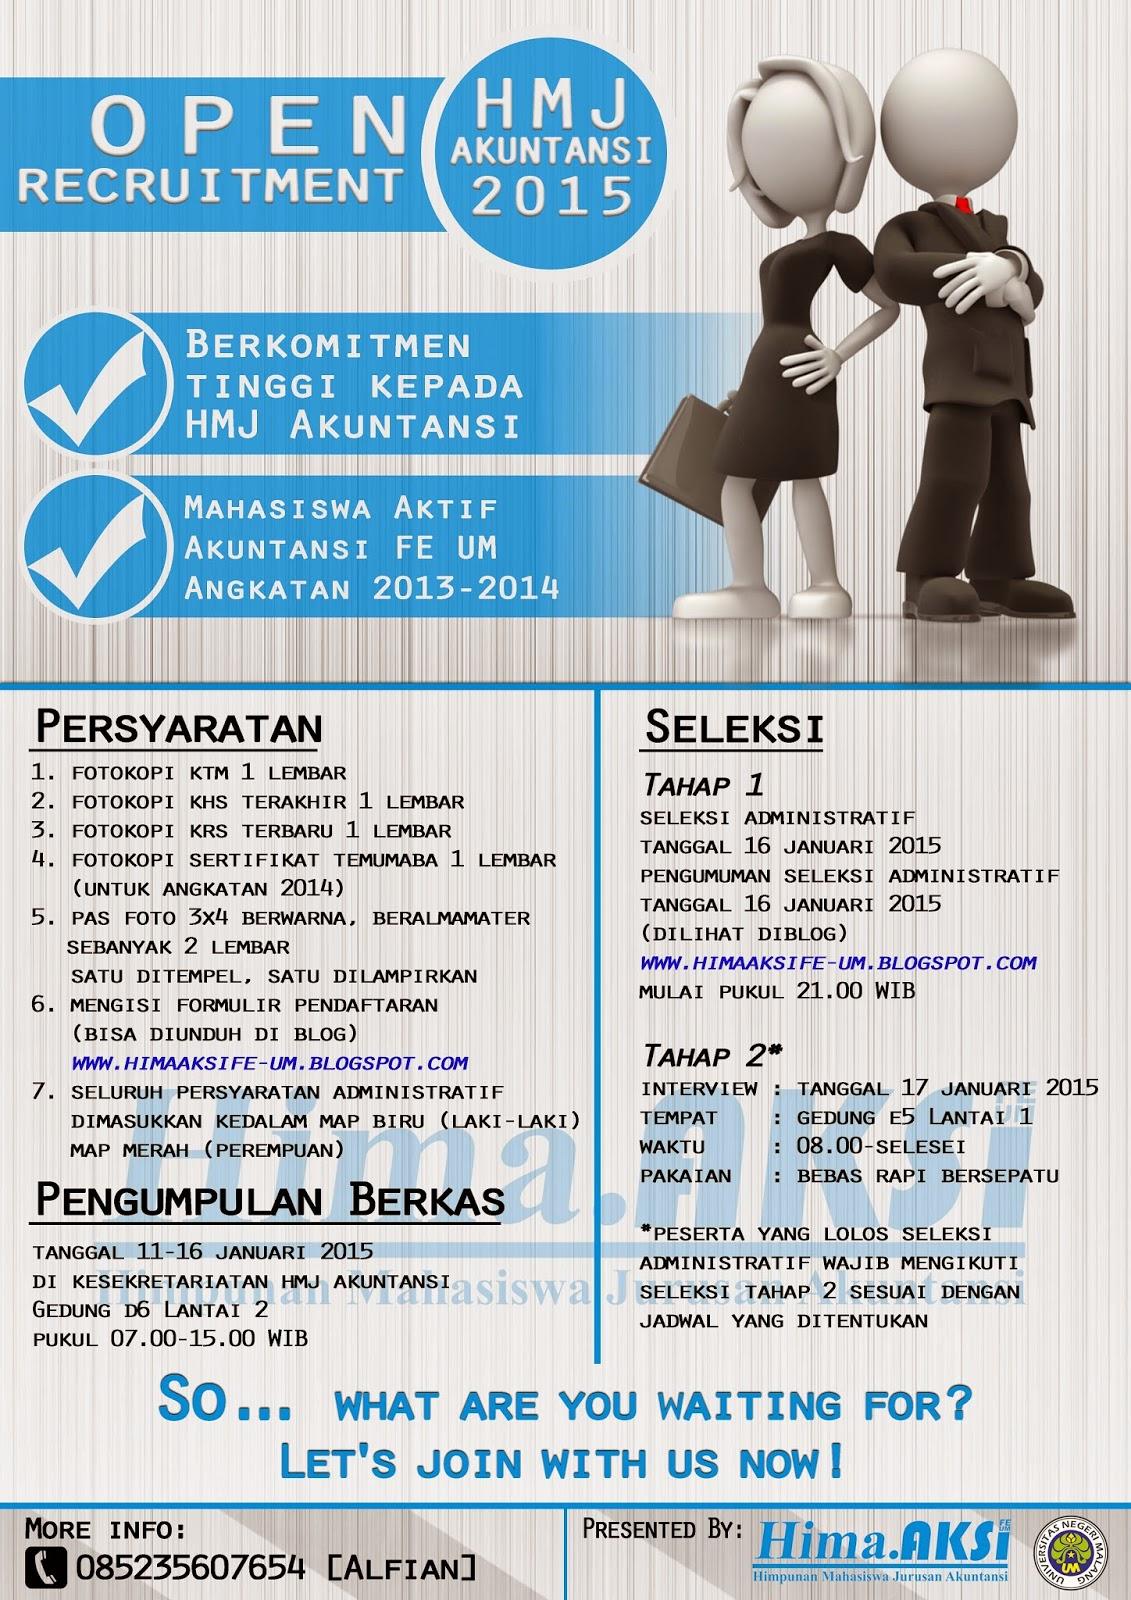 Open Recruitment Pengurus Hima Aksi Periode 2015 Blog Non Aktif